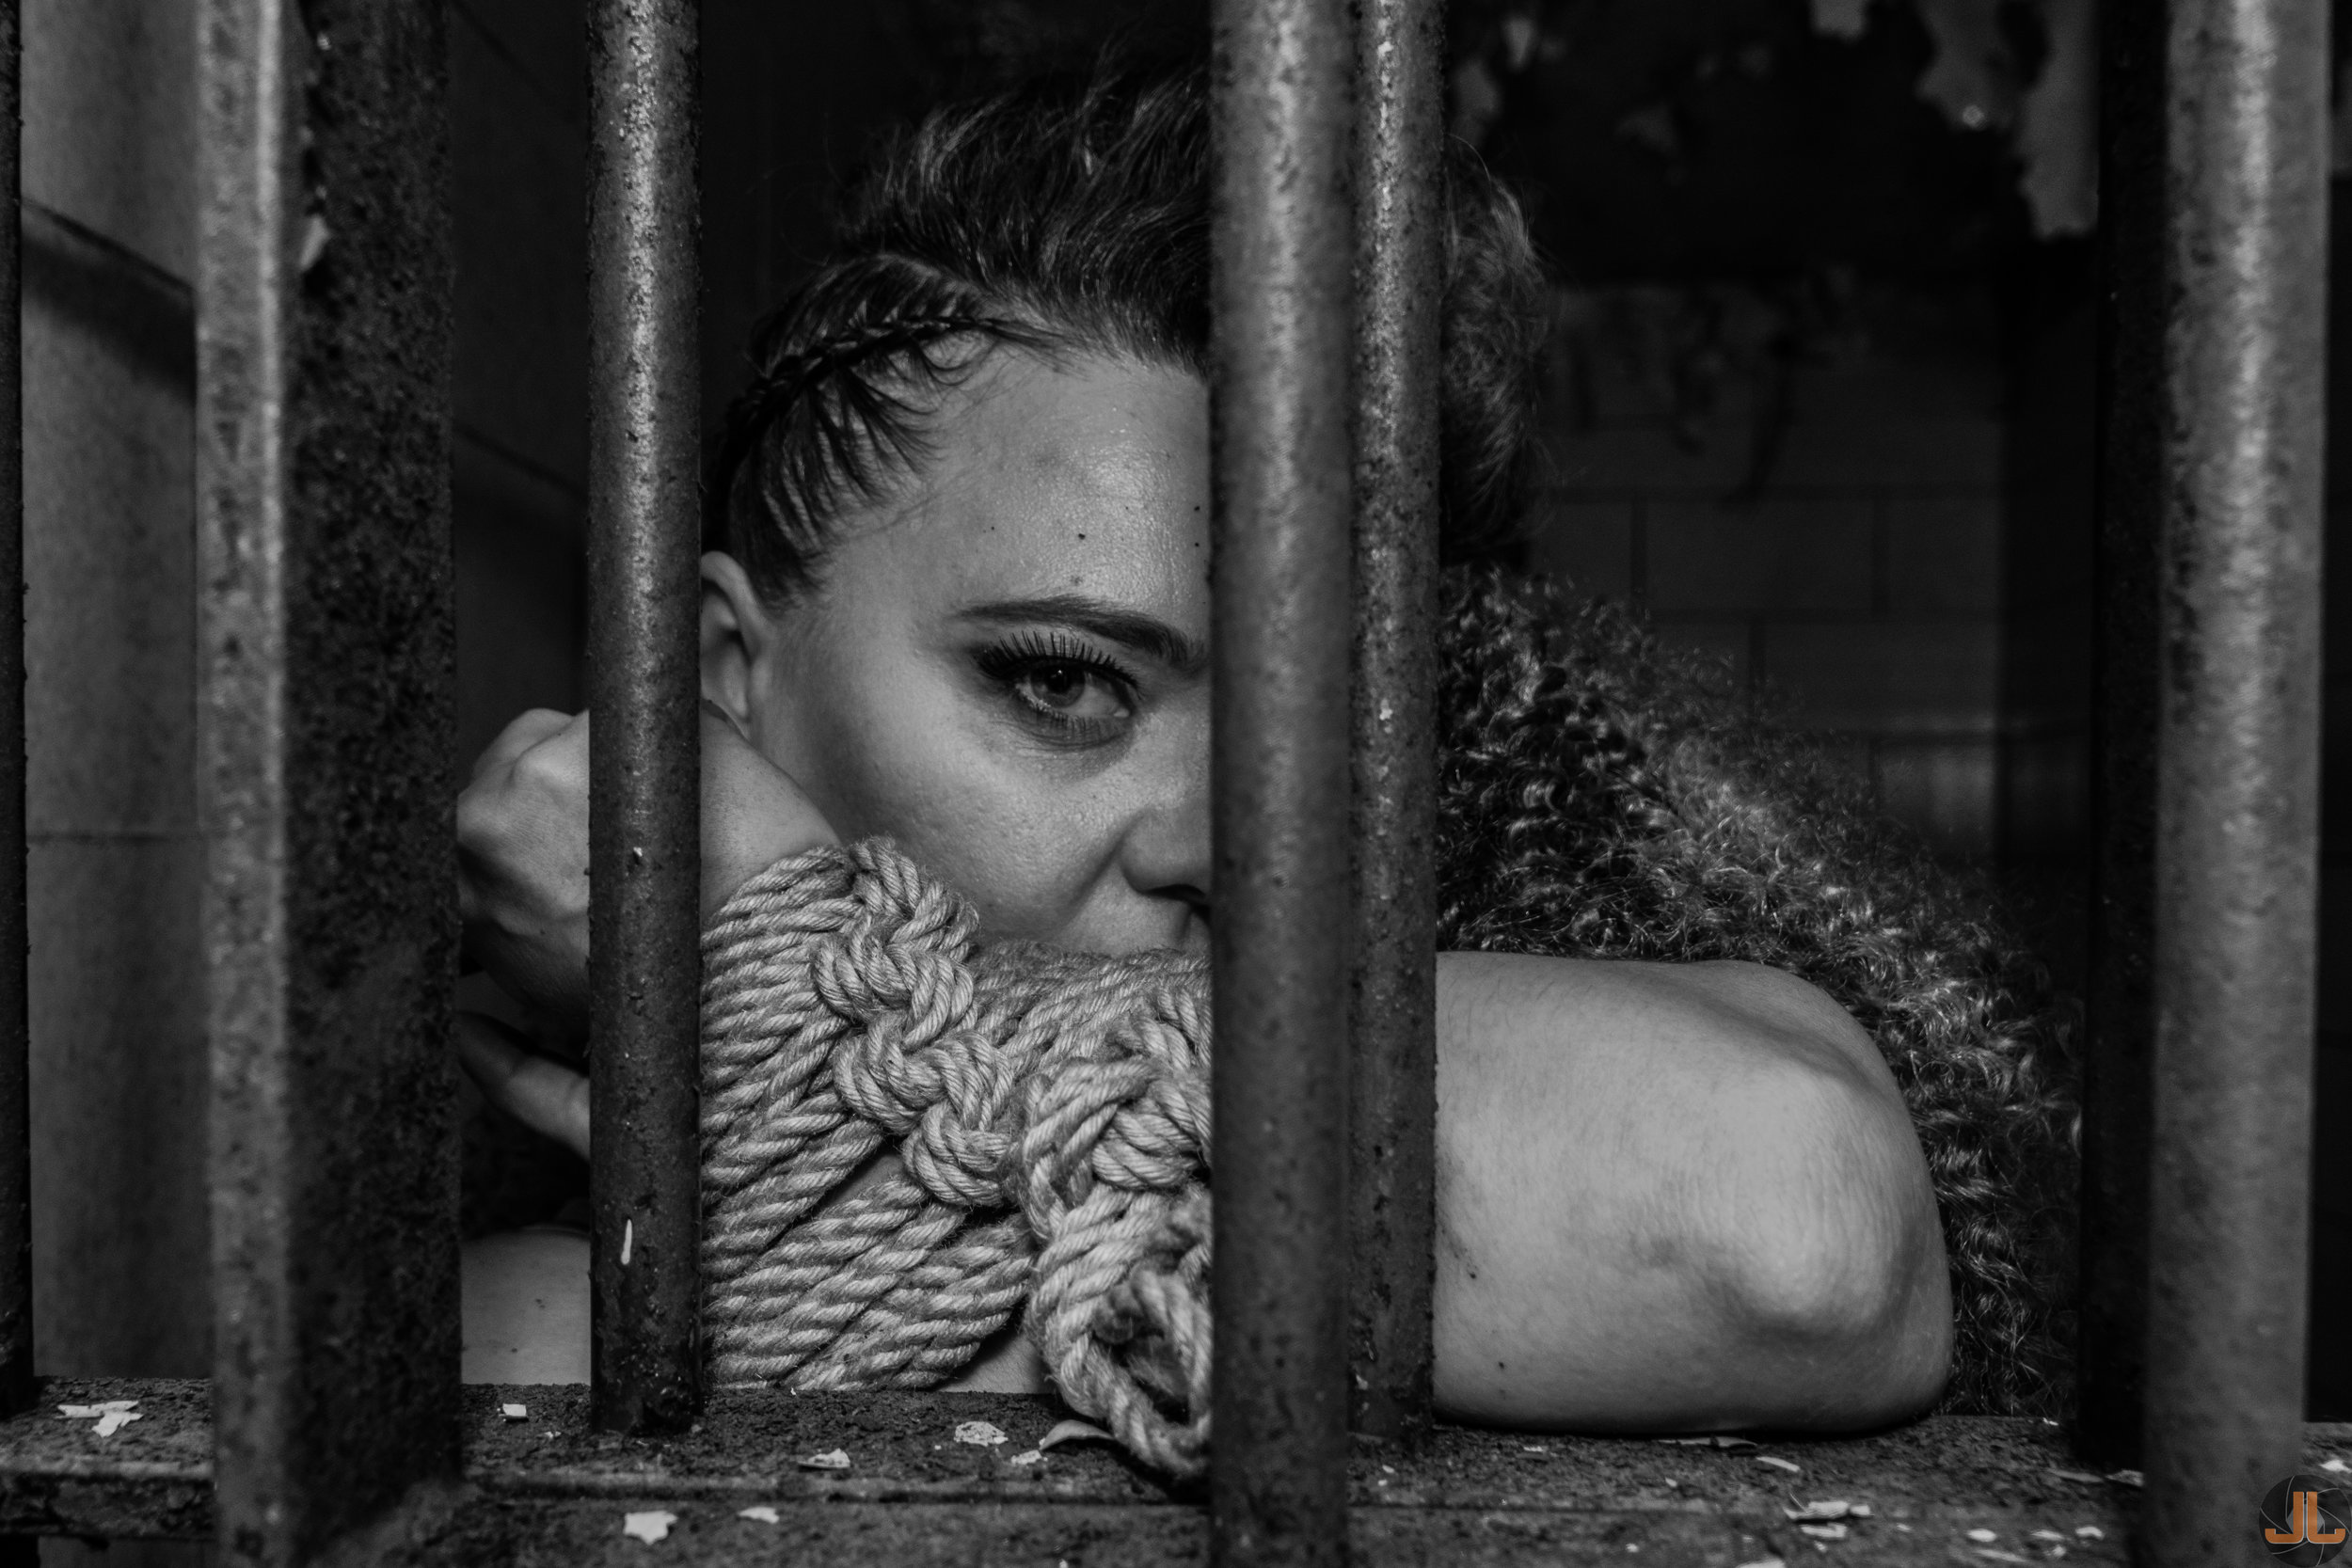 Photographer: Joshua Luttenberger,, Model: Olha Vayda, MUA: Samantha Terry, Hair: Bianca Naranjo. Designer: Mario & Jorge, Rope Work: Solomon Leviticus Abrams